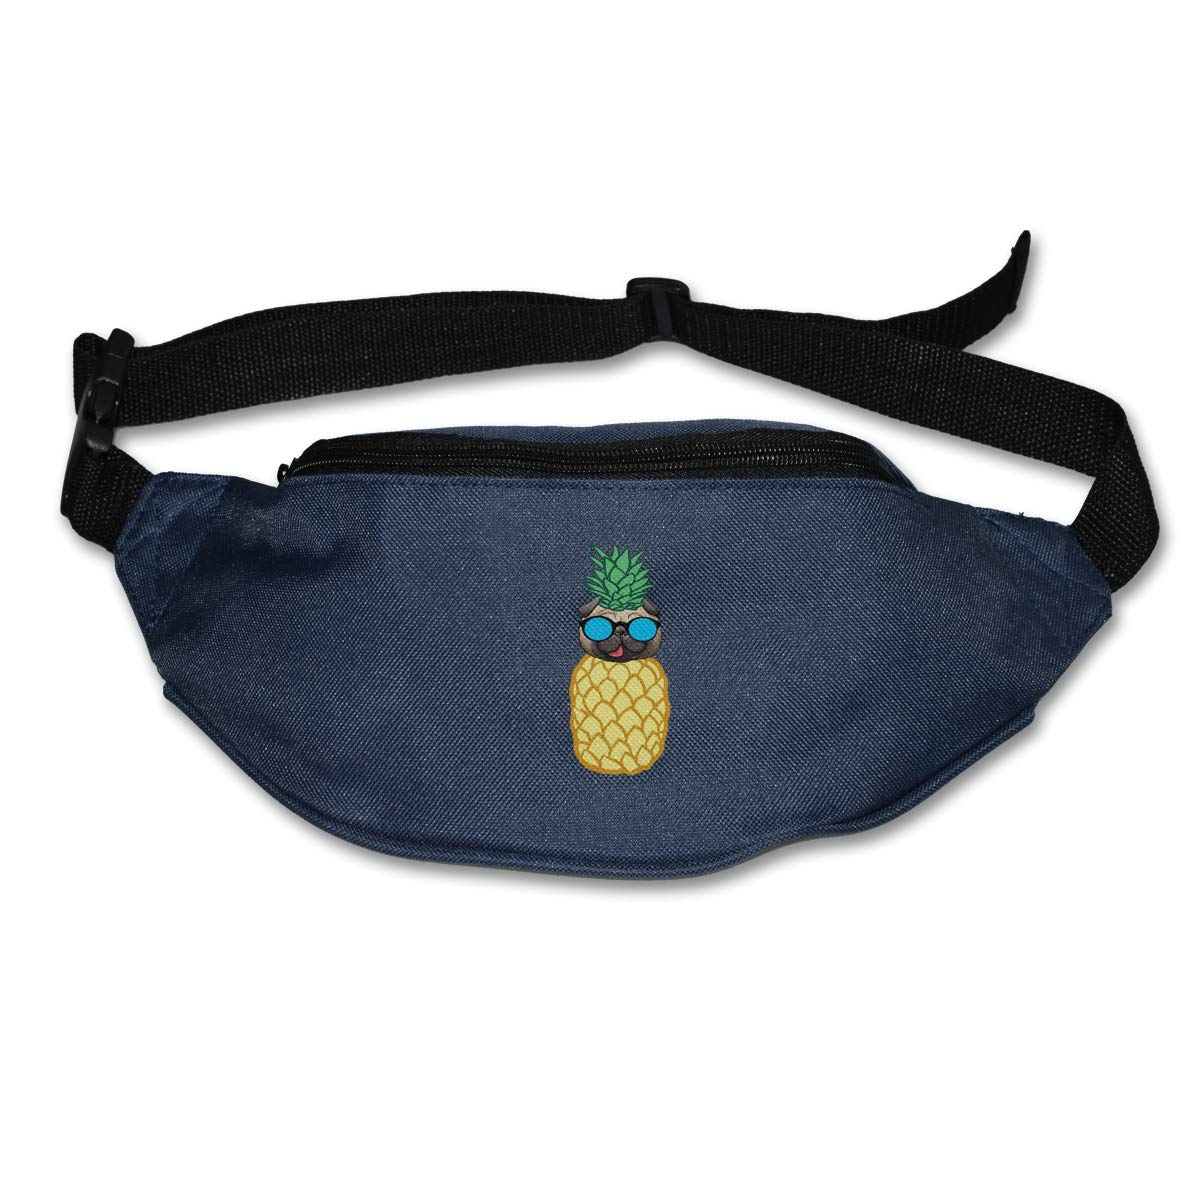 Cool Pineapple Pug Sport Waist Bag Fanny Pack Adjustable For Travel